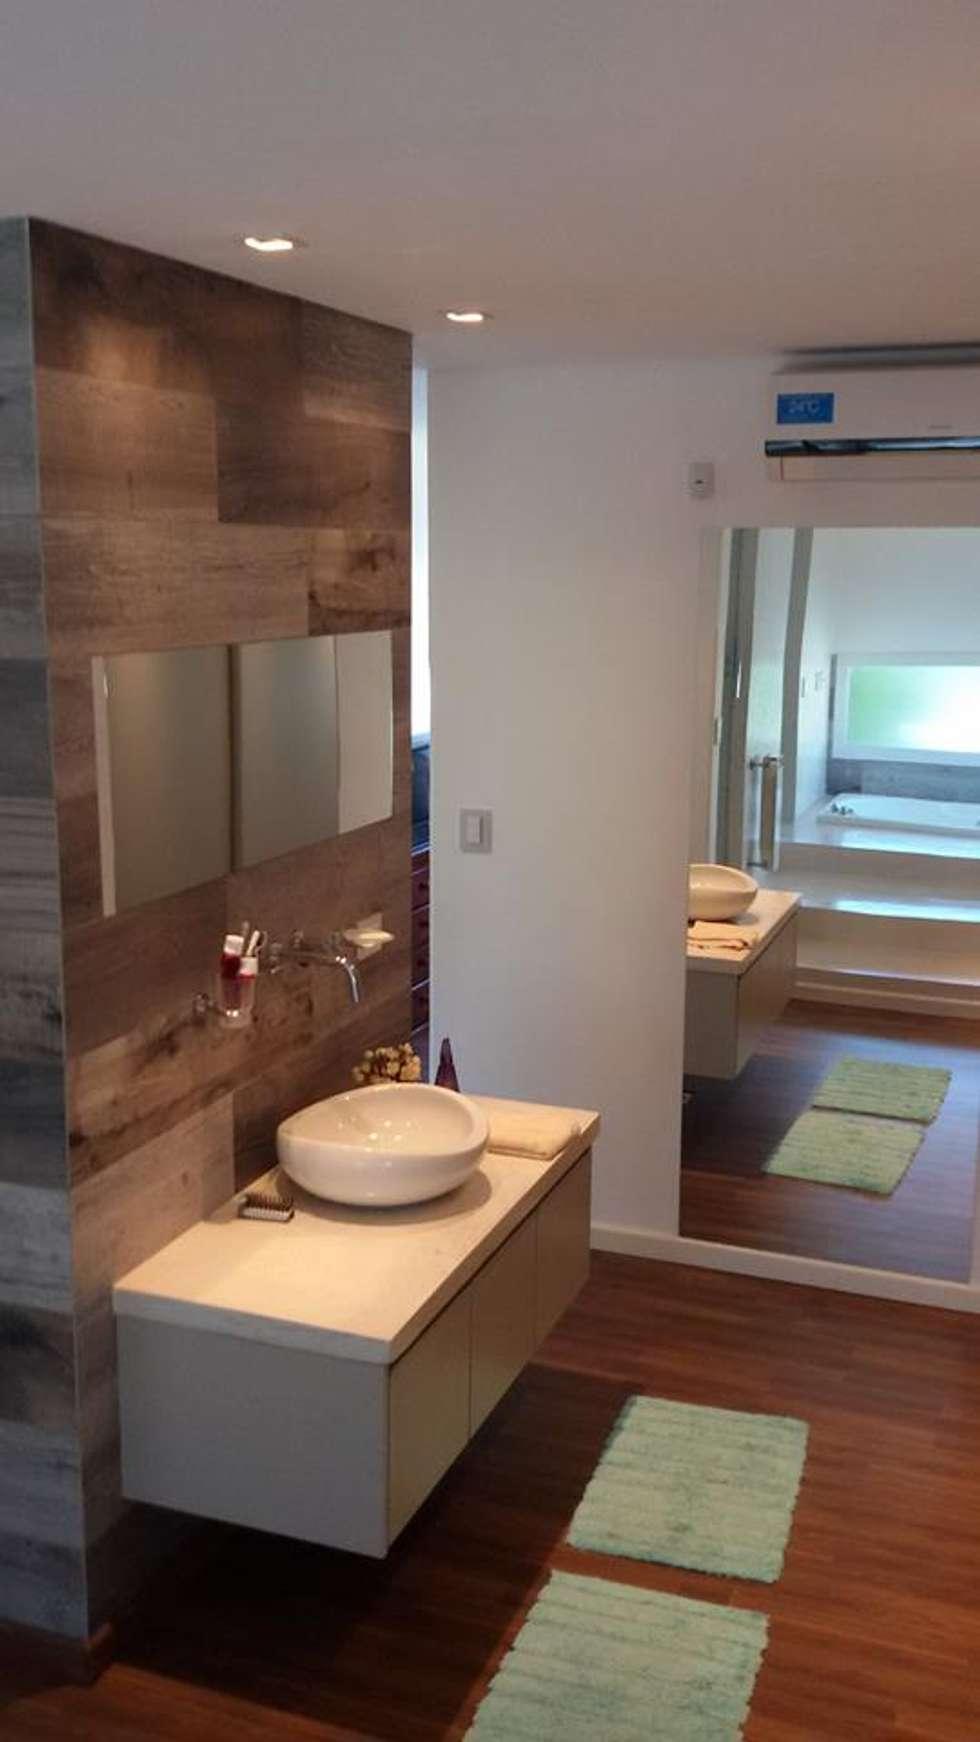 Ante baño : Baños de estilo moderno por Estudio A+I